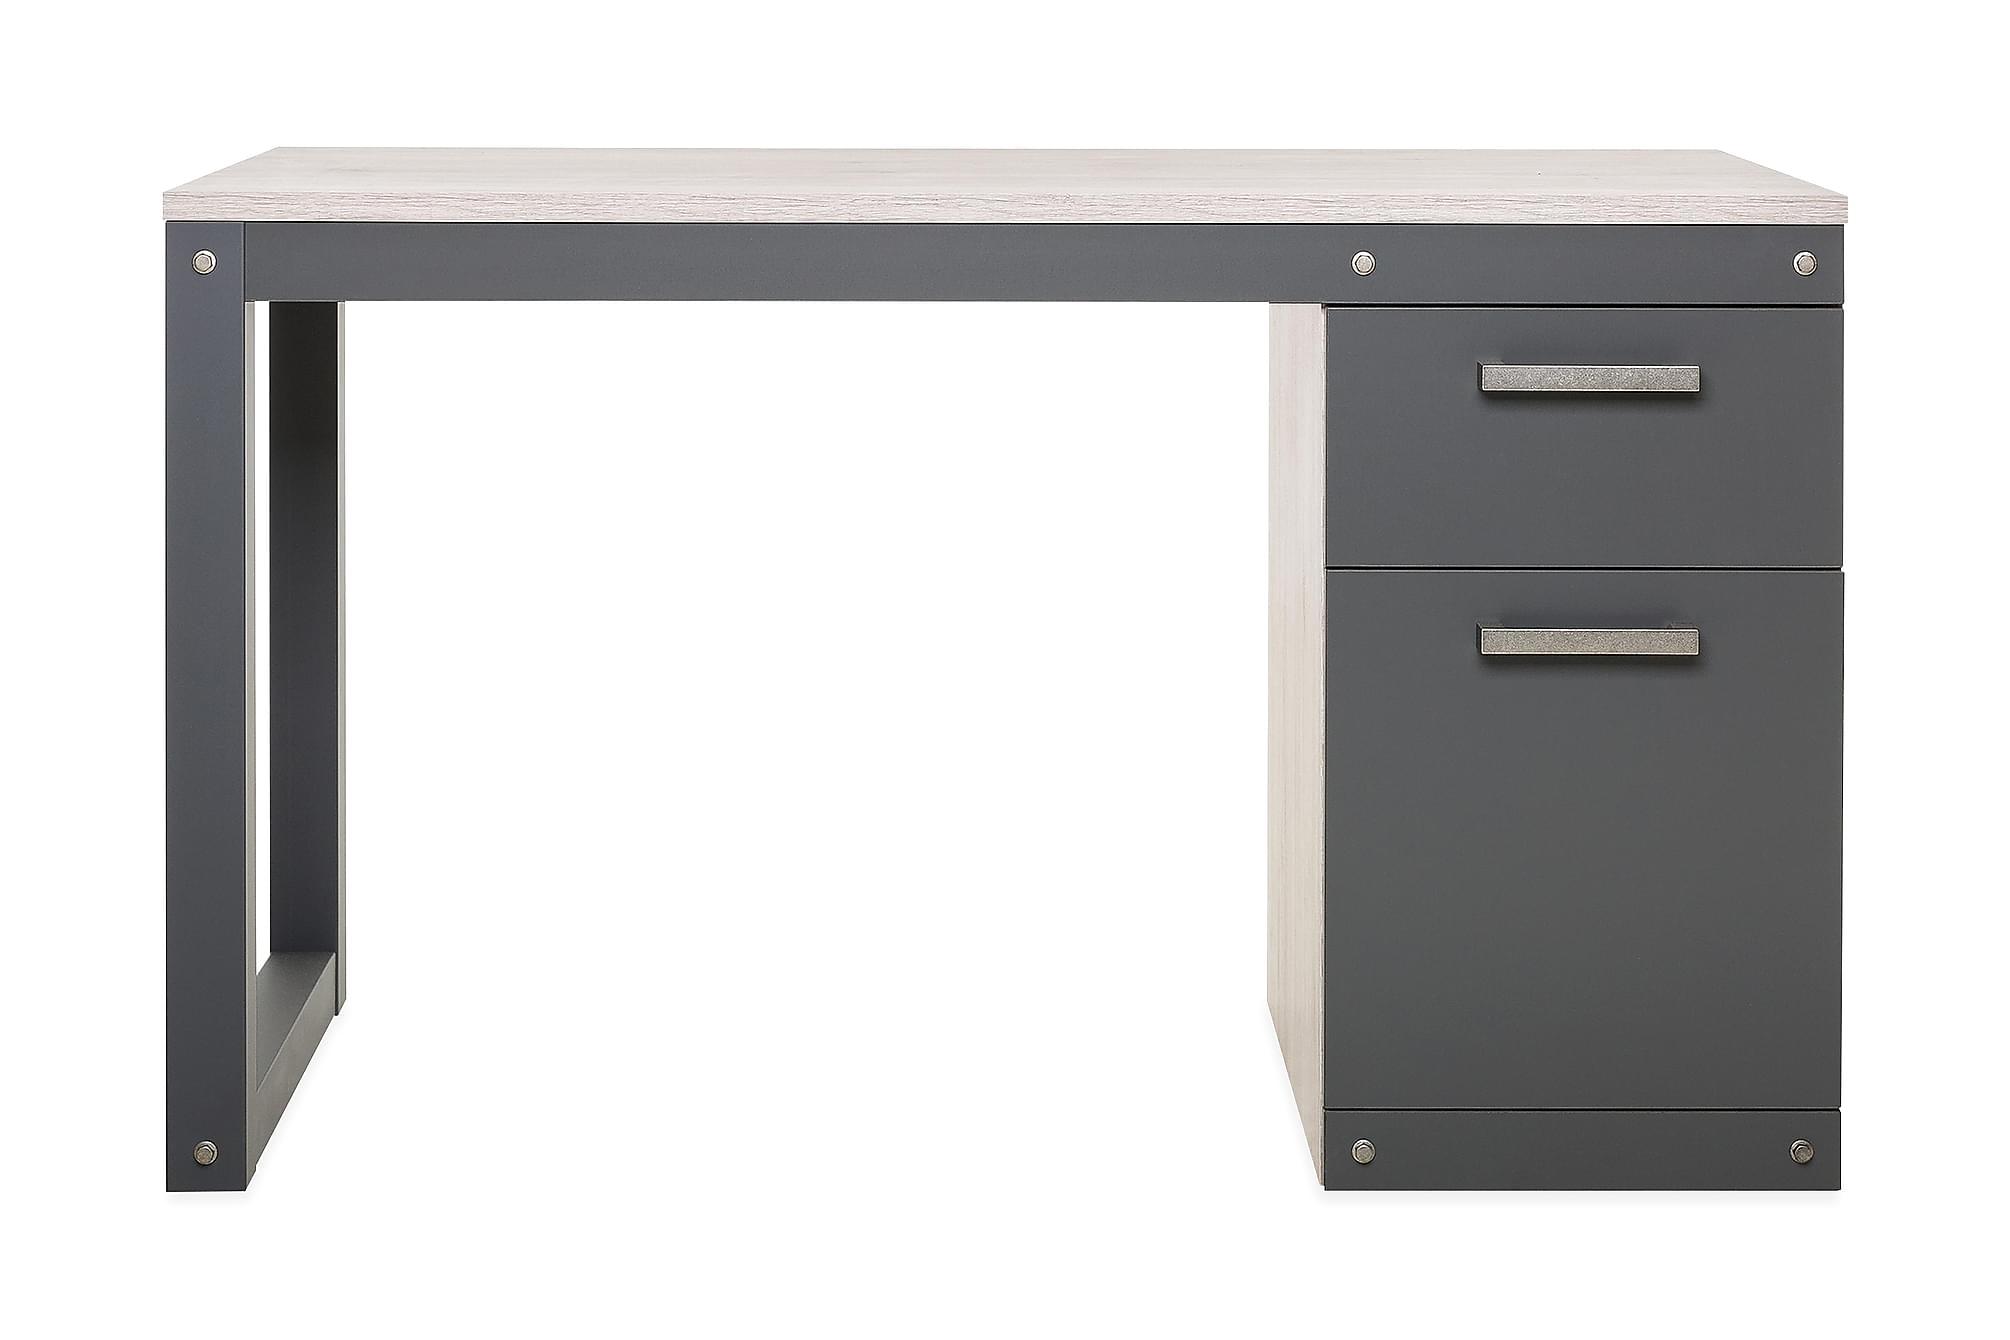 AMARONE Skrivbord Brun/Grå, Skrivbord